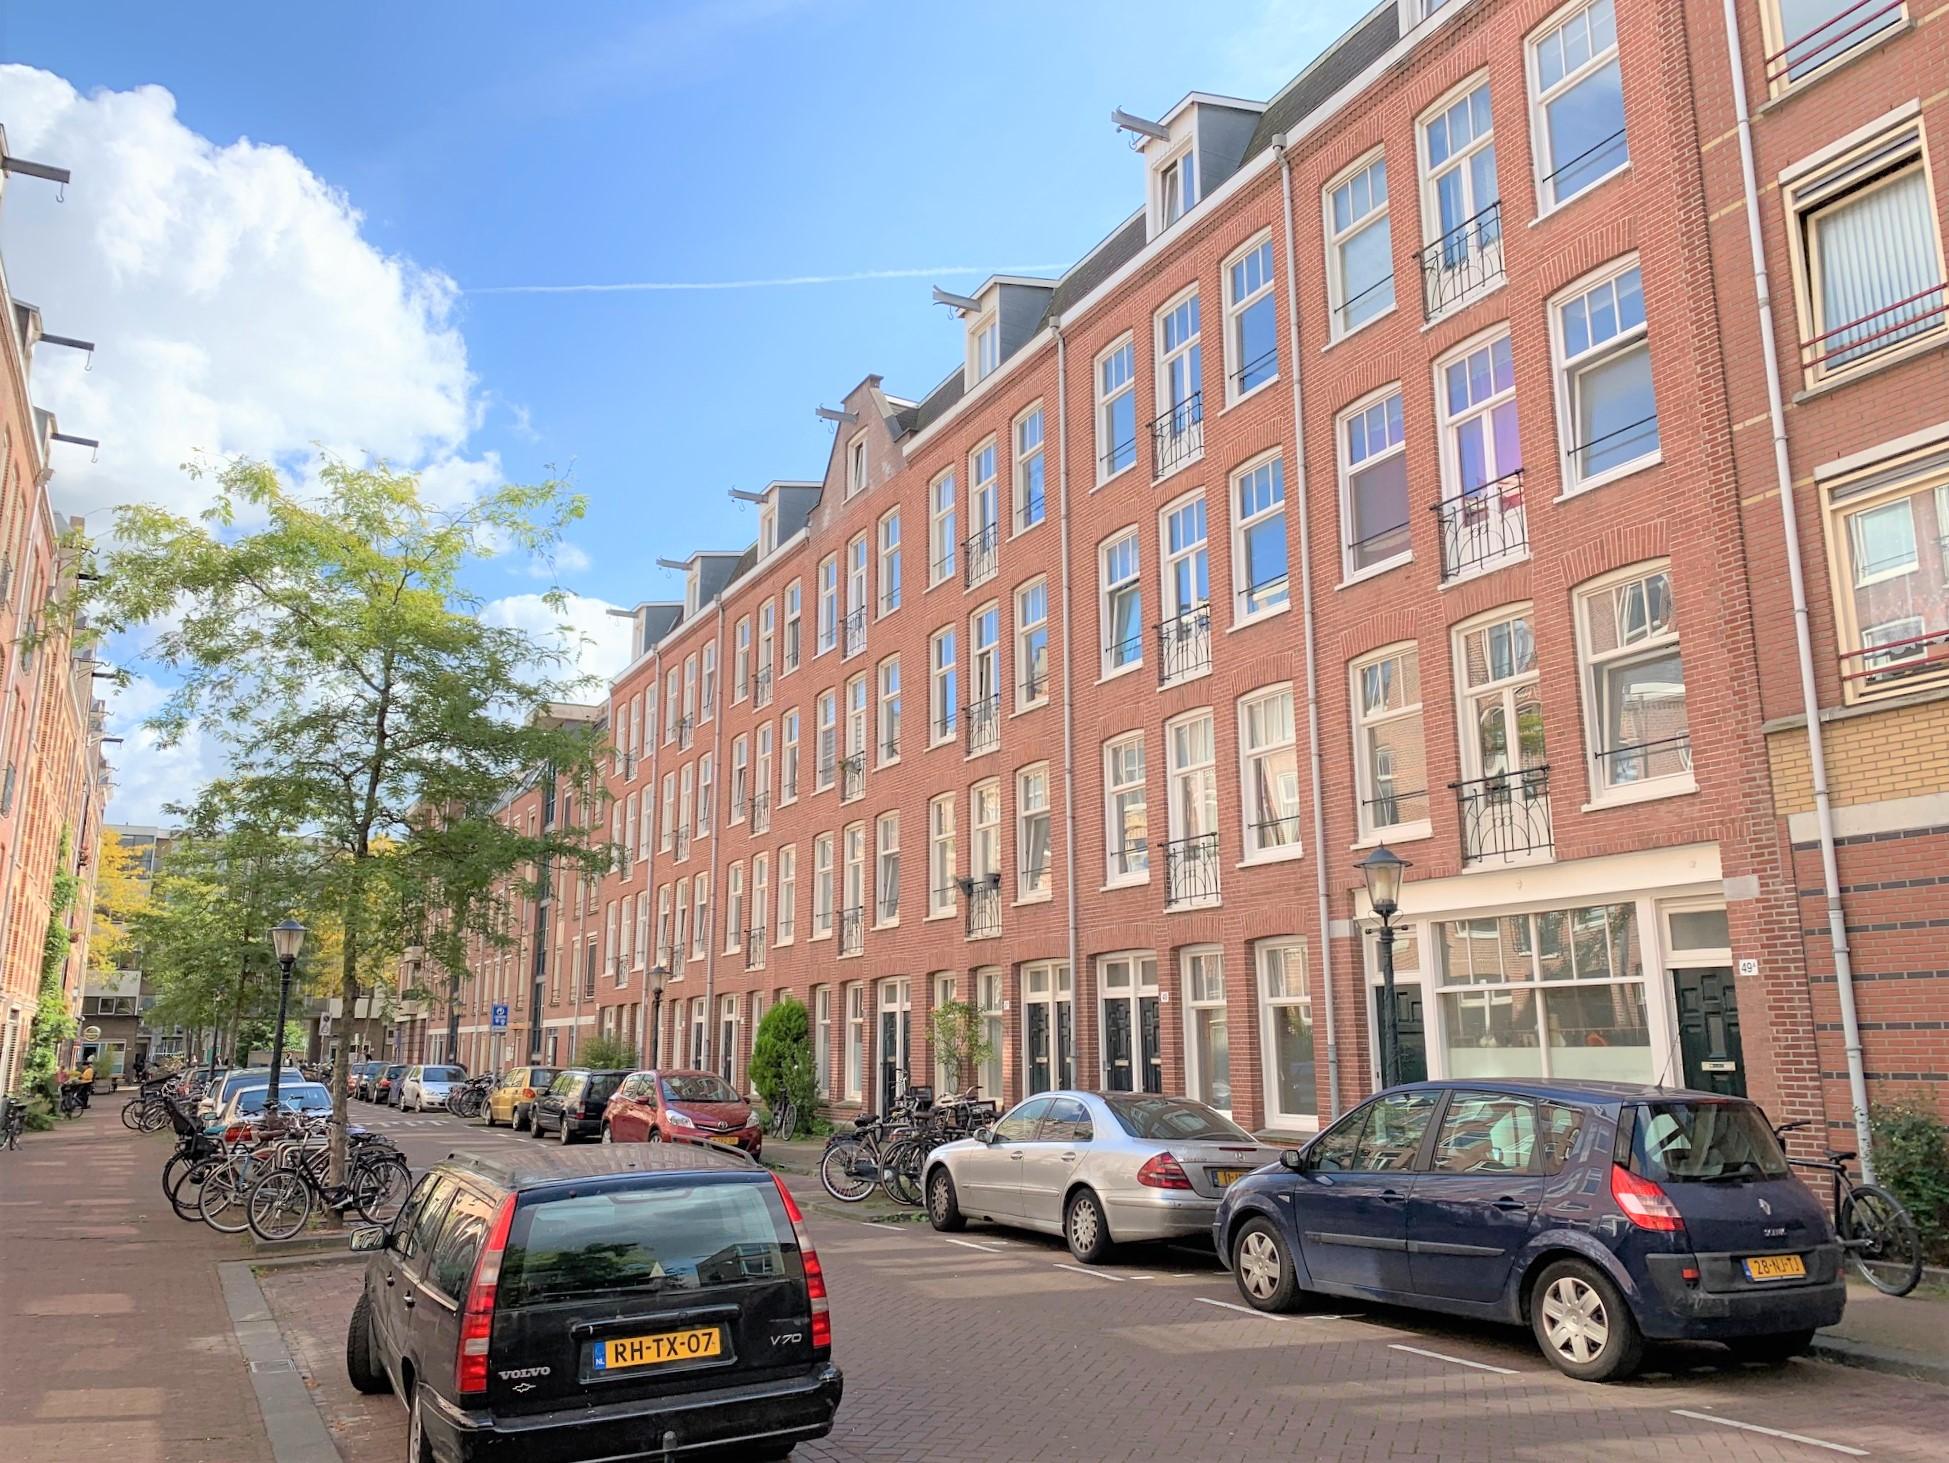 J.M. Kemperstraat, Amsterdam